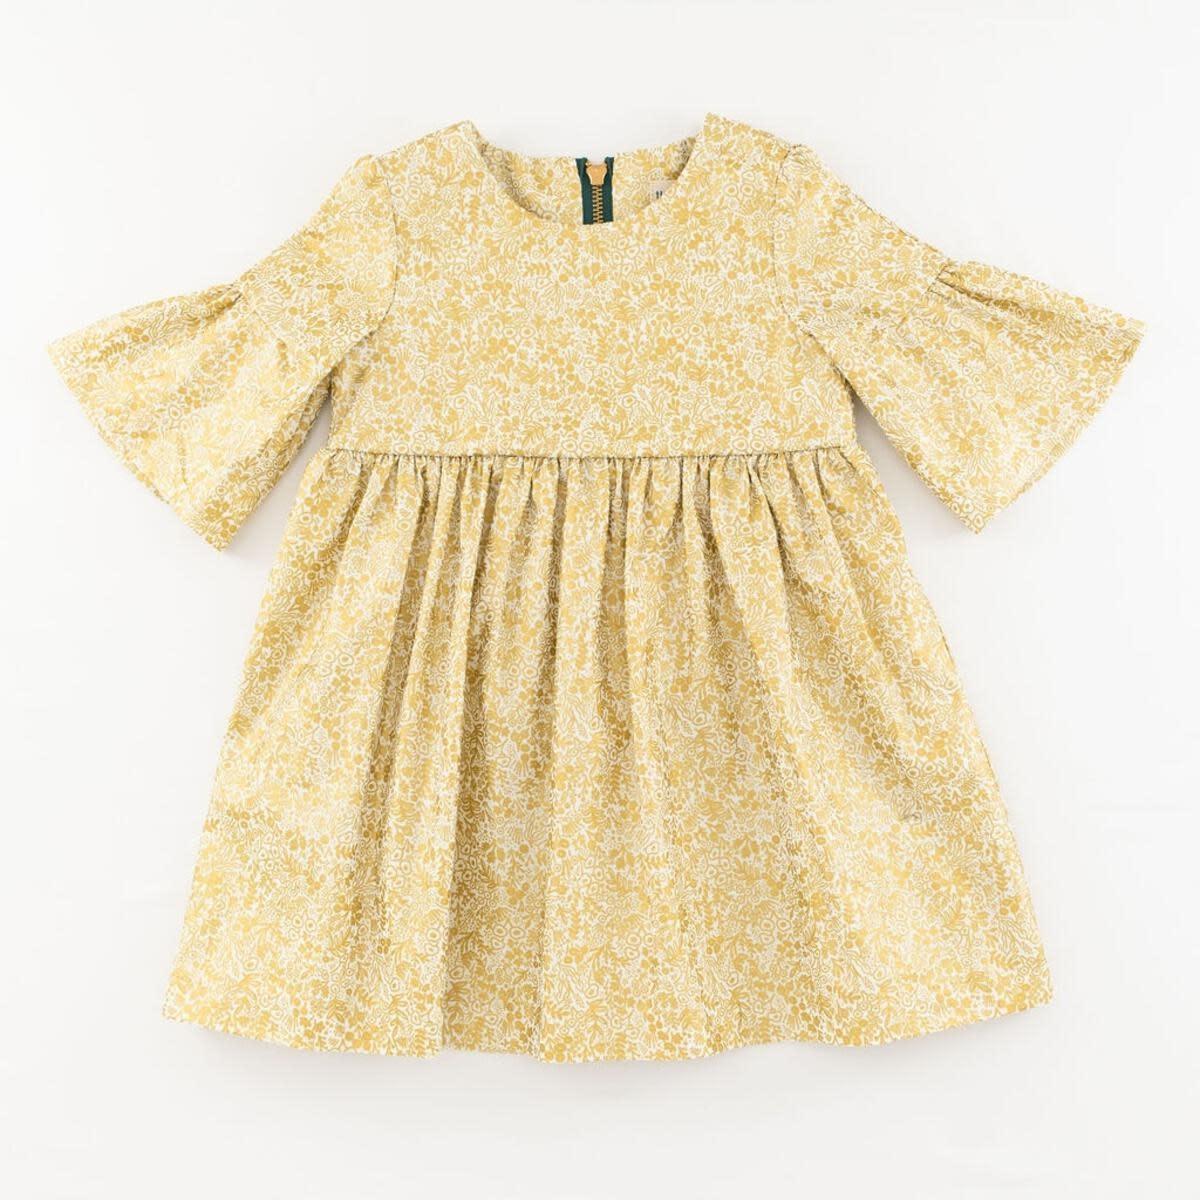 Thimble Thimble Party Dress in Golden Garden